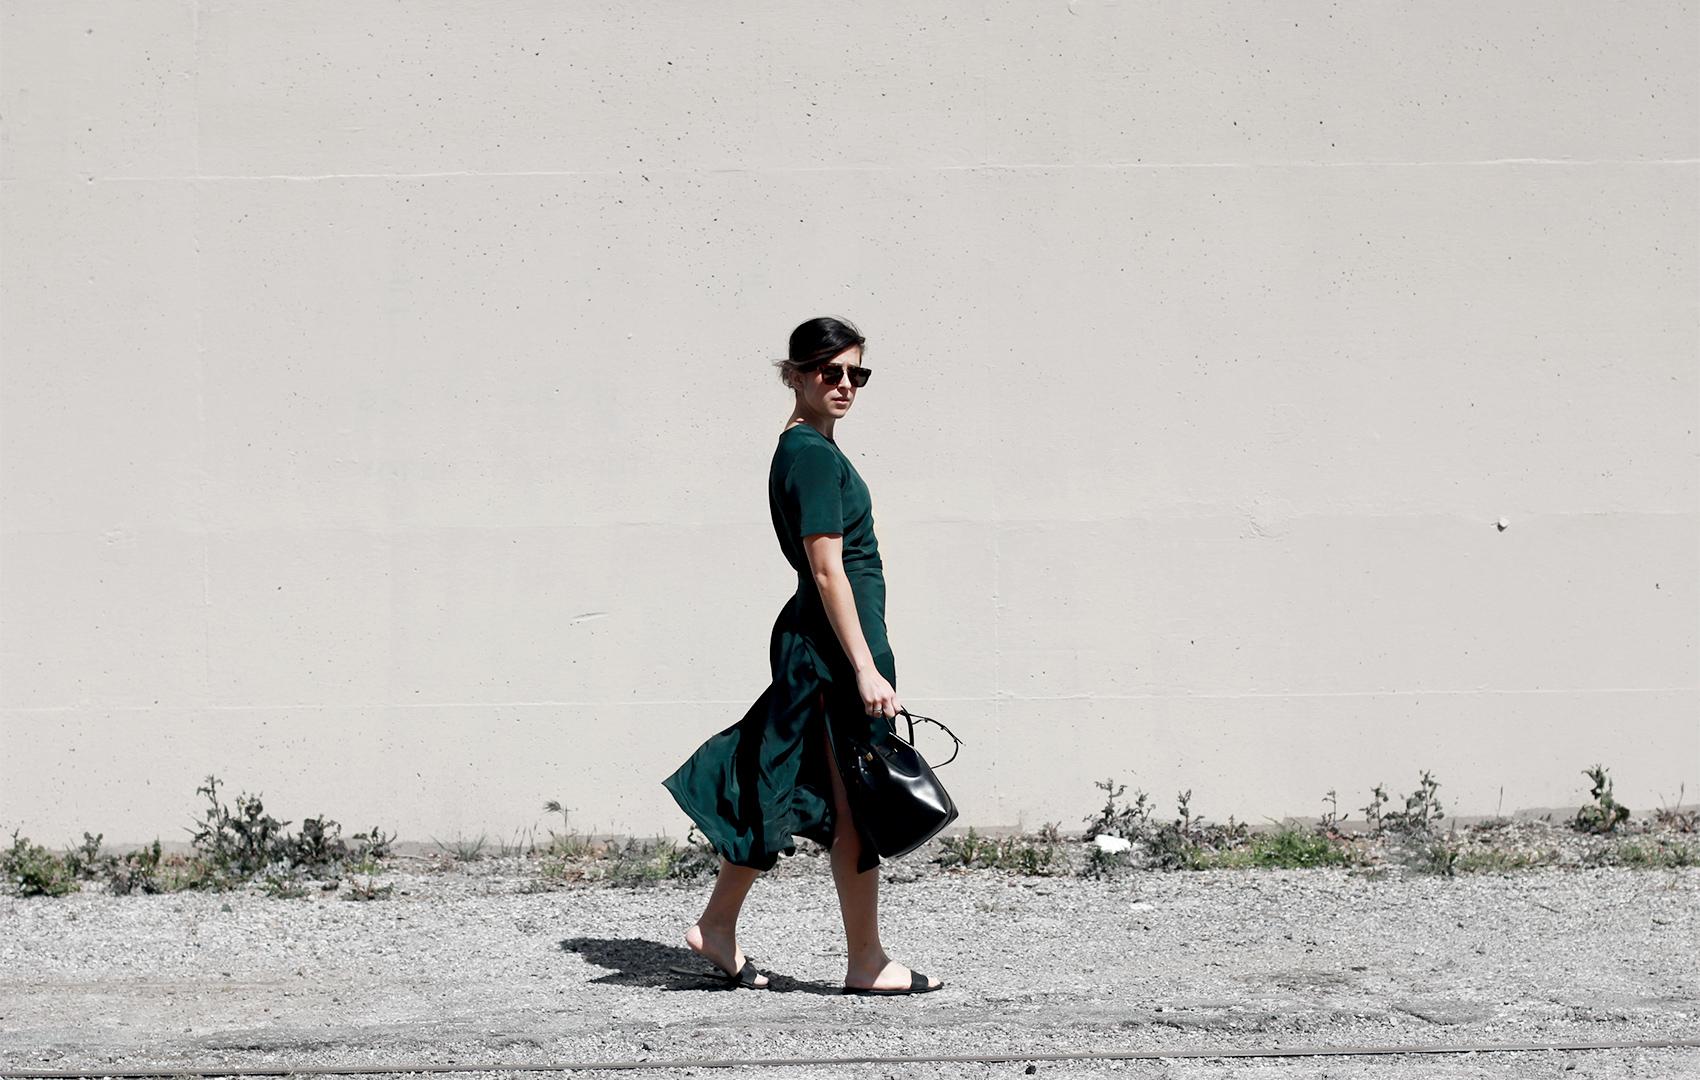 540-twelvoefour-1700-bucket-bag-summer-dress-IMG_7152.jpg